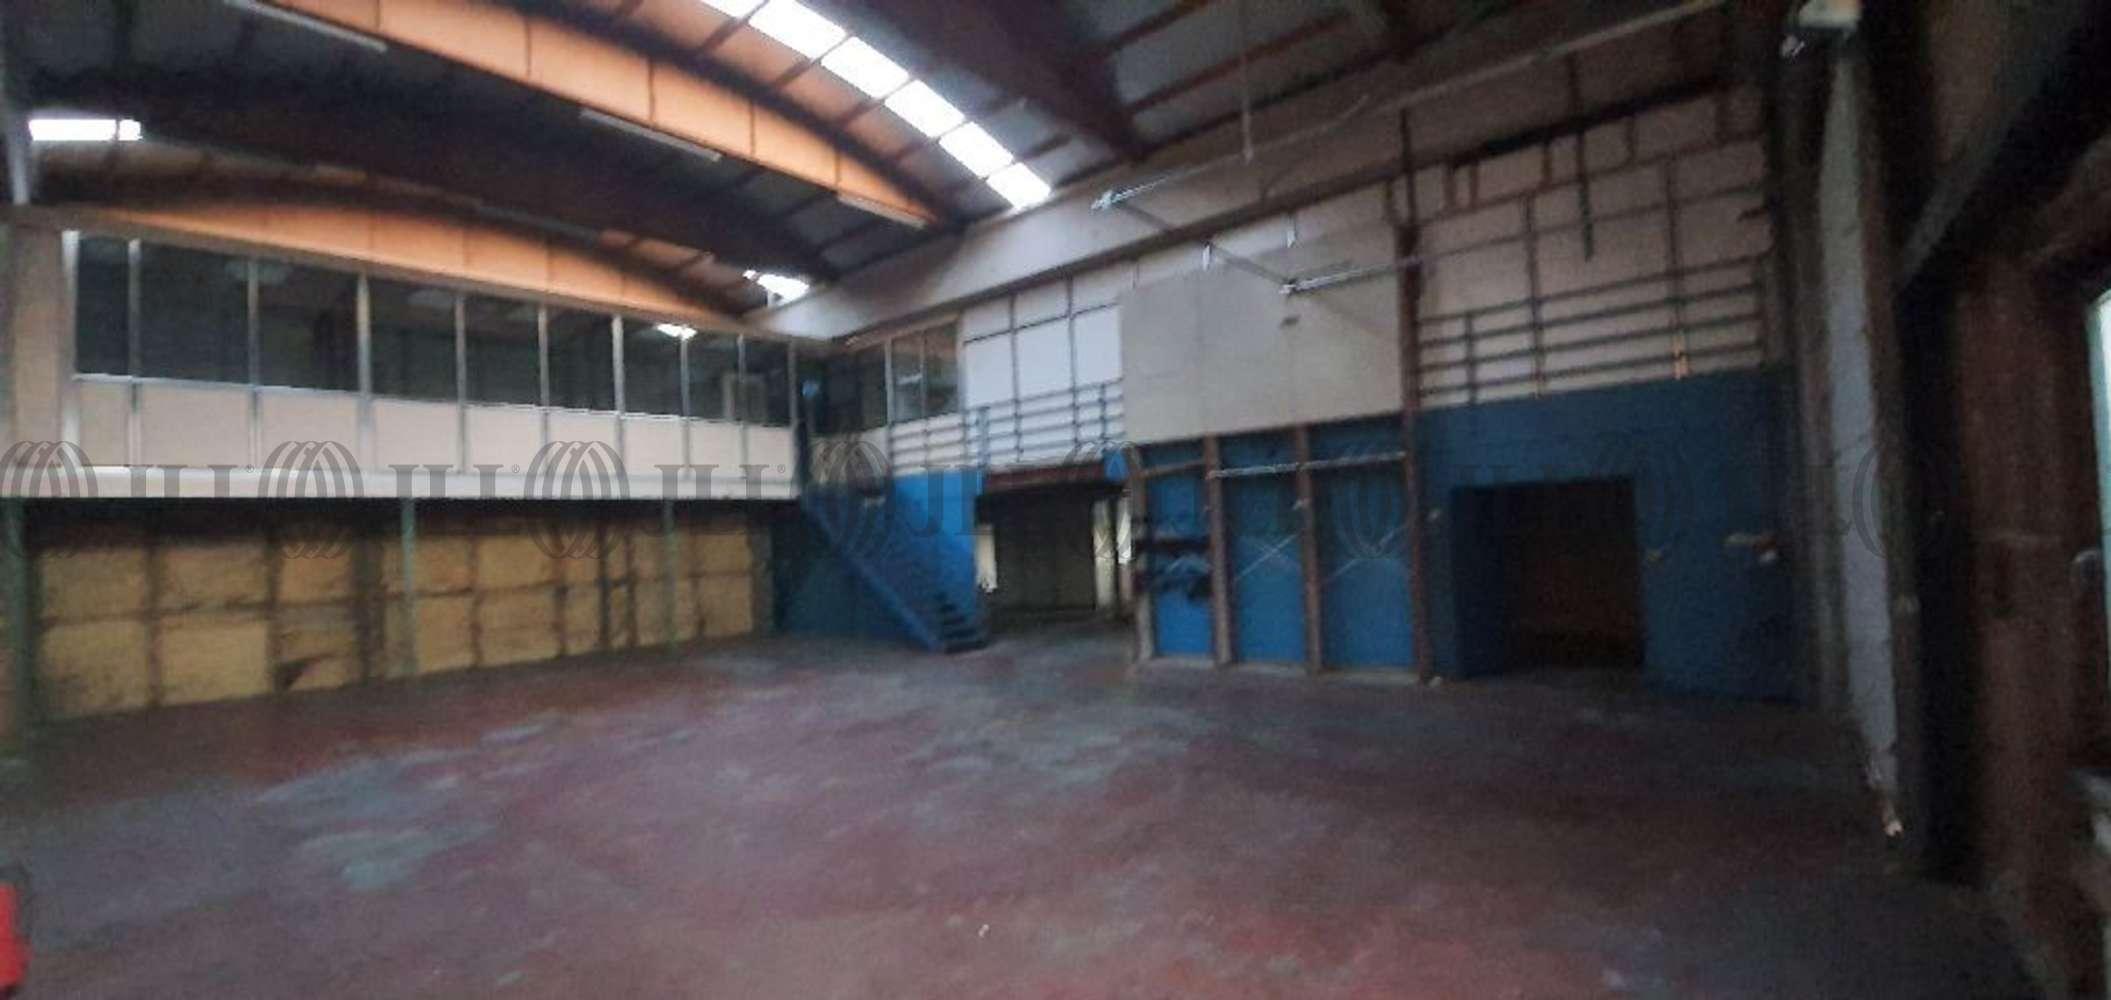 Activités/entrepôt Dardilly, 69570 - Location locaux d'activité Dardilly Lyon - 10921716